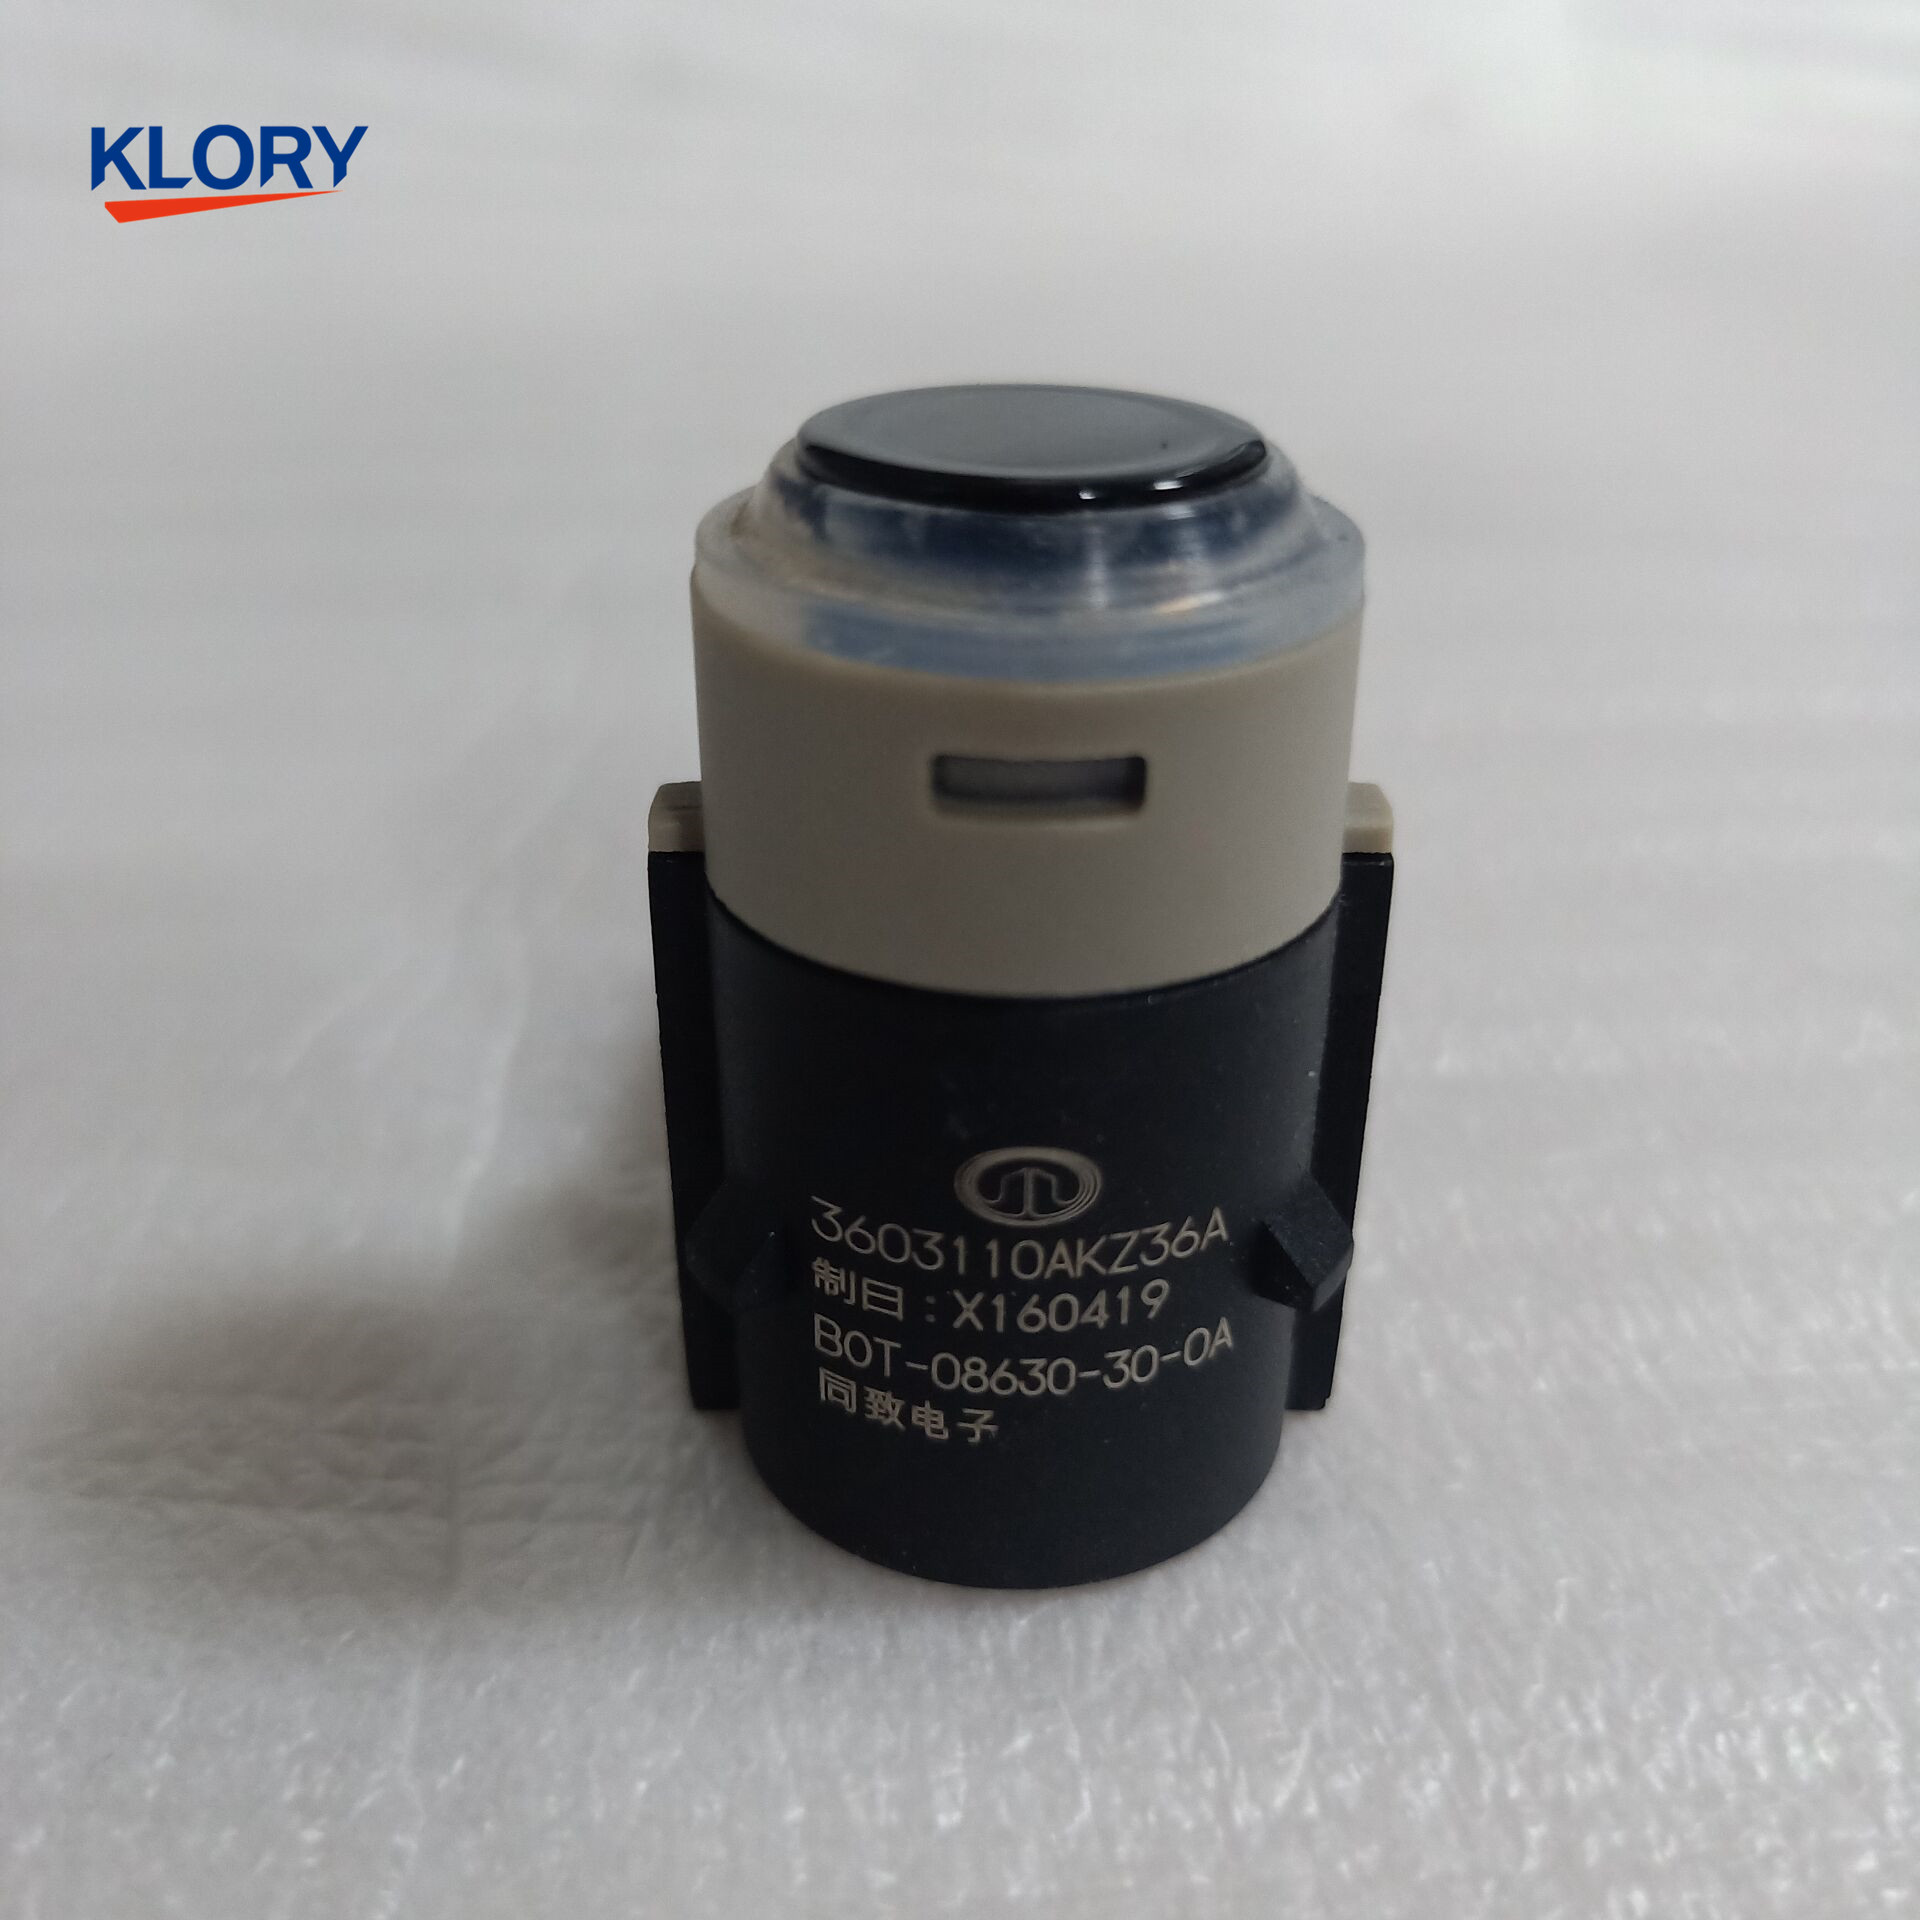 3603110AKZ36A Anti-collision Radar Sensor/Clip For Great Wall Haval H6 Sport